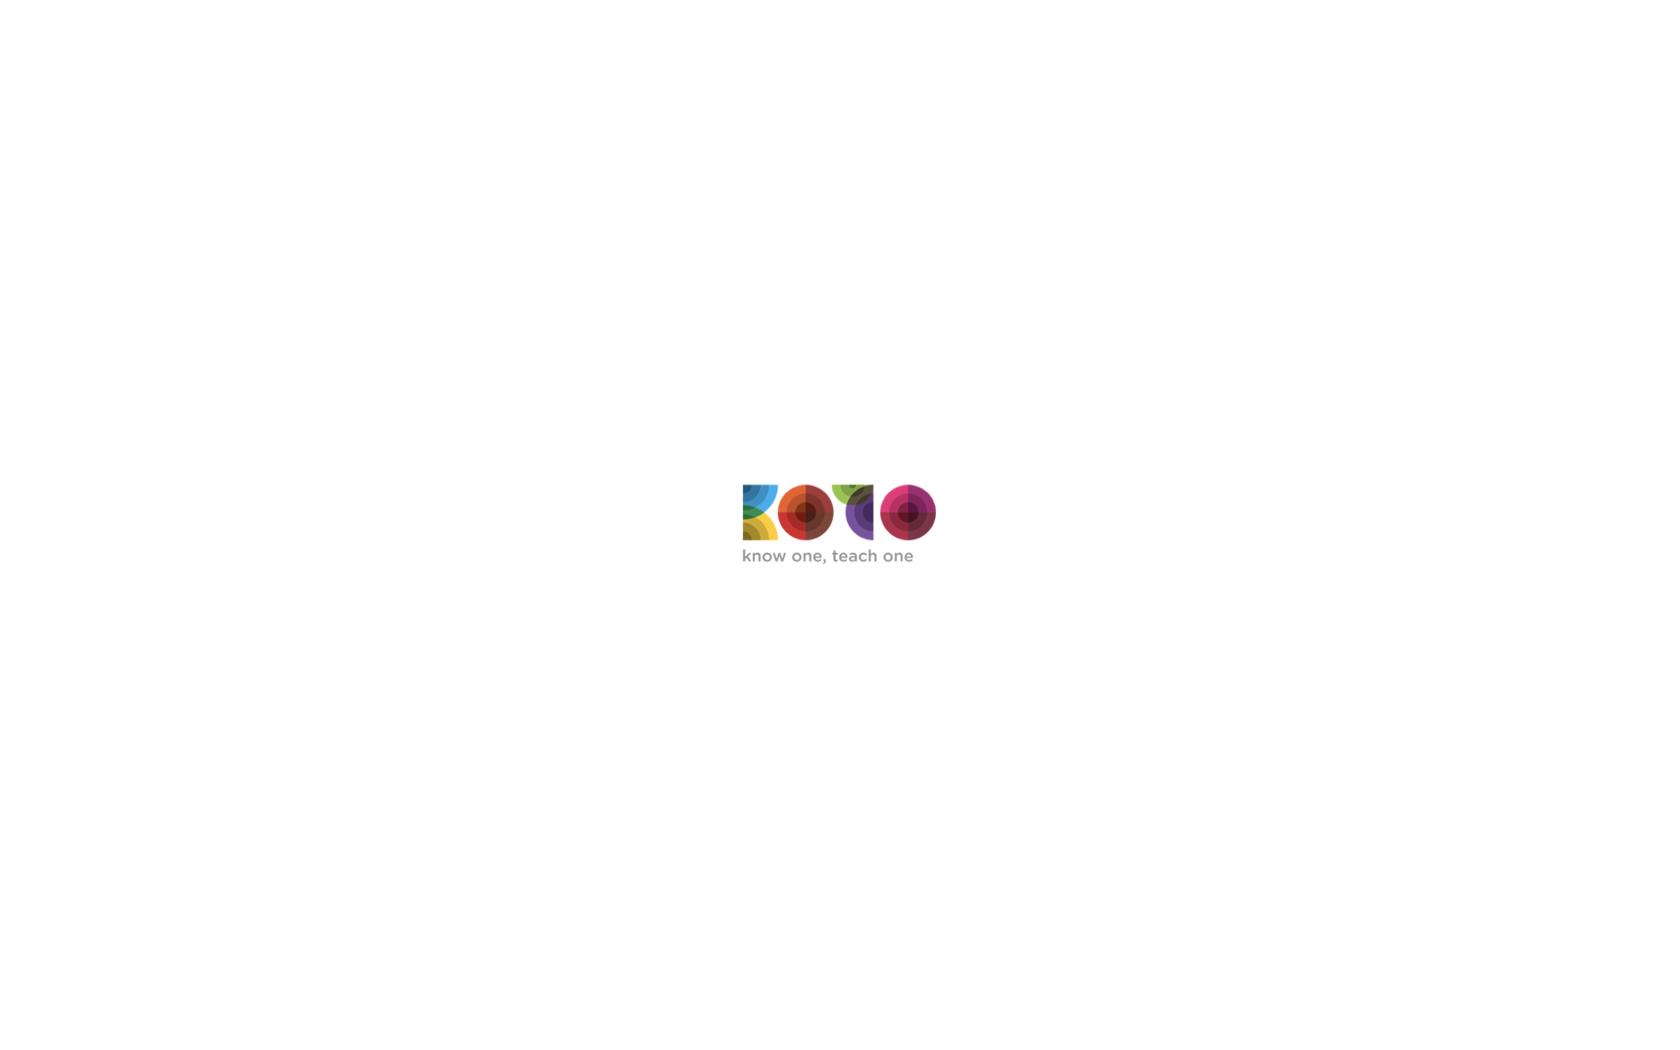 KOTO - Case Study FINAL 02162019.020.jpeg